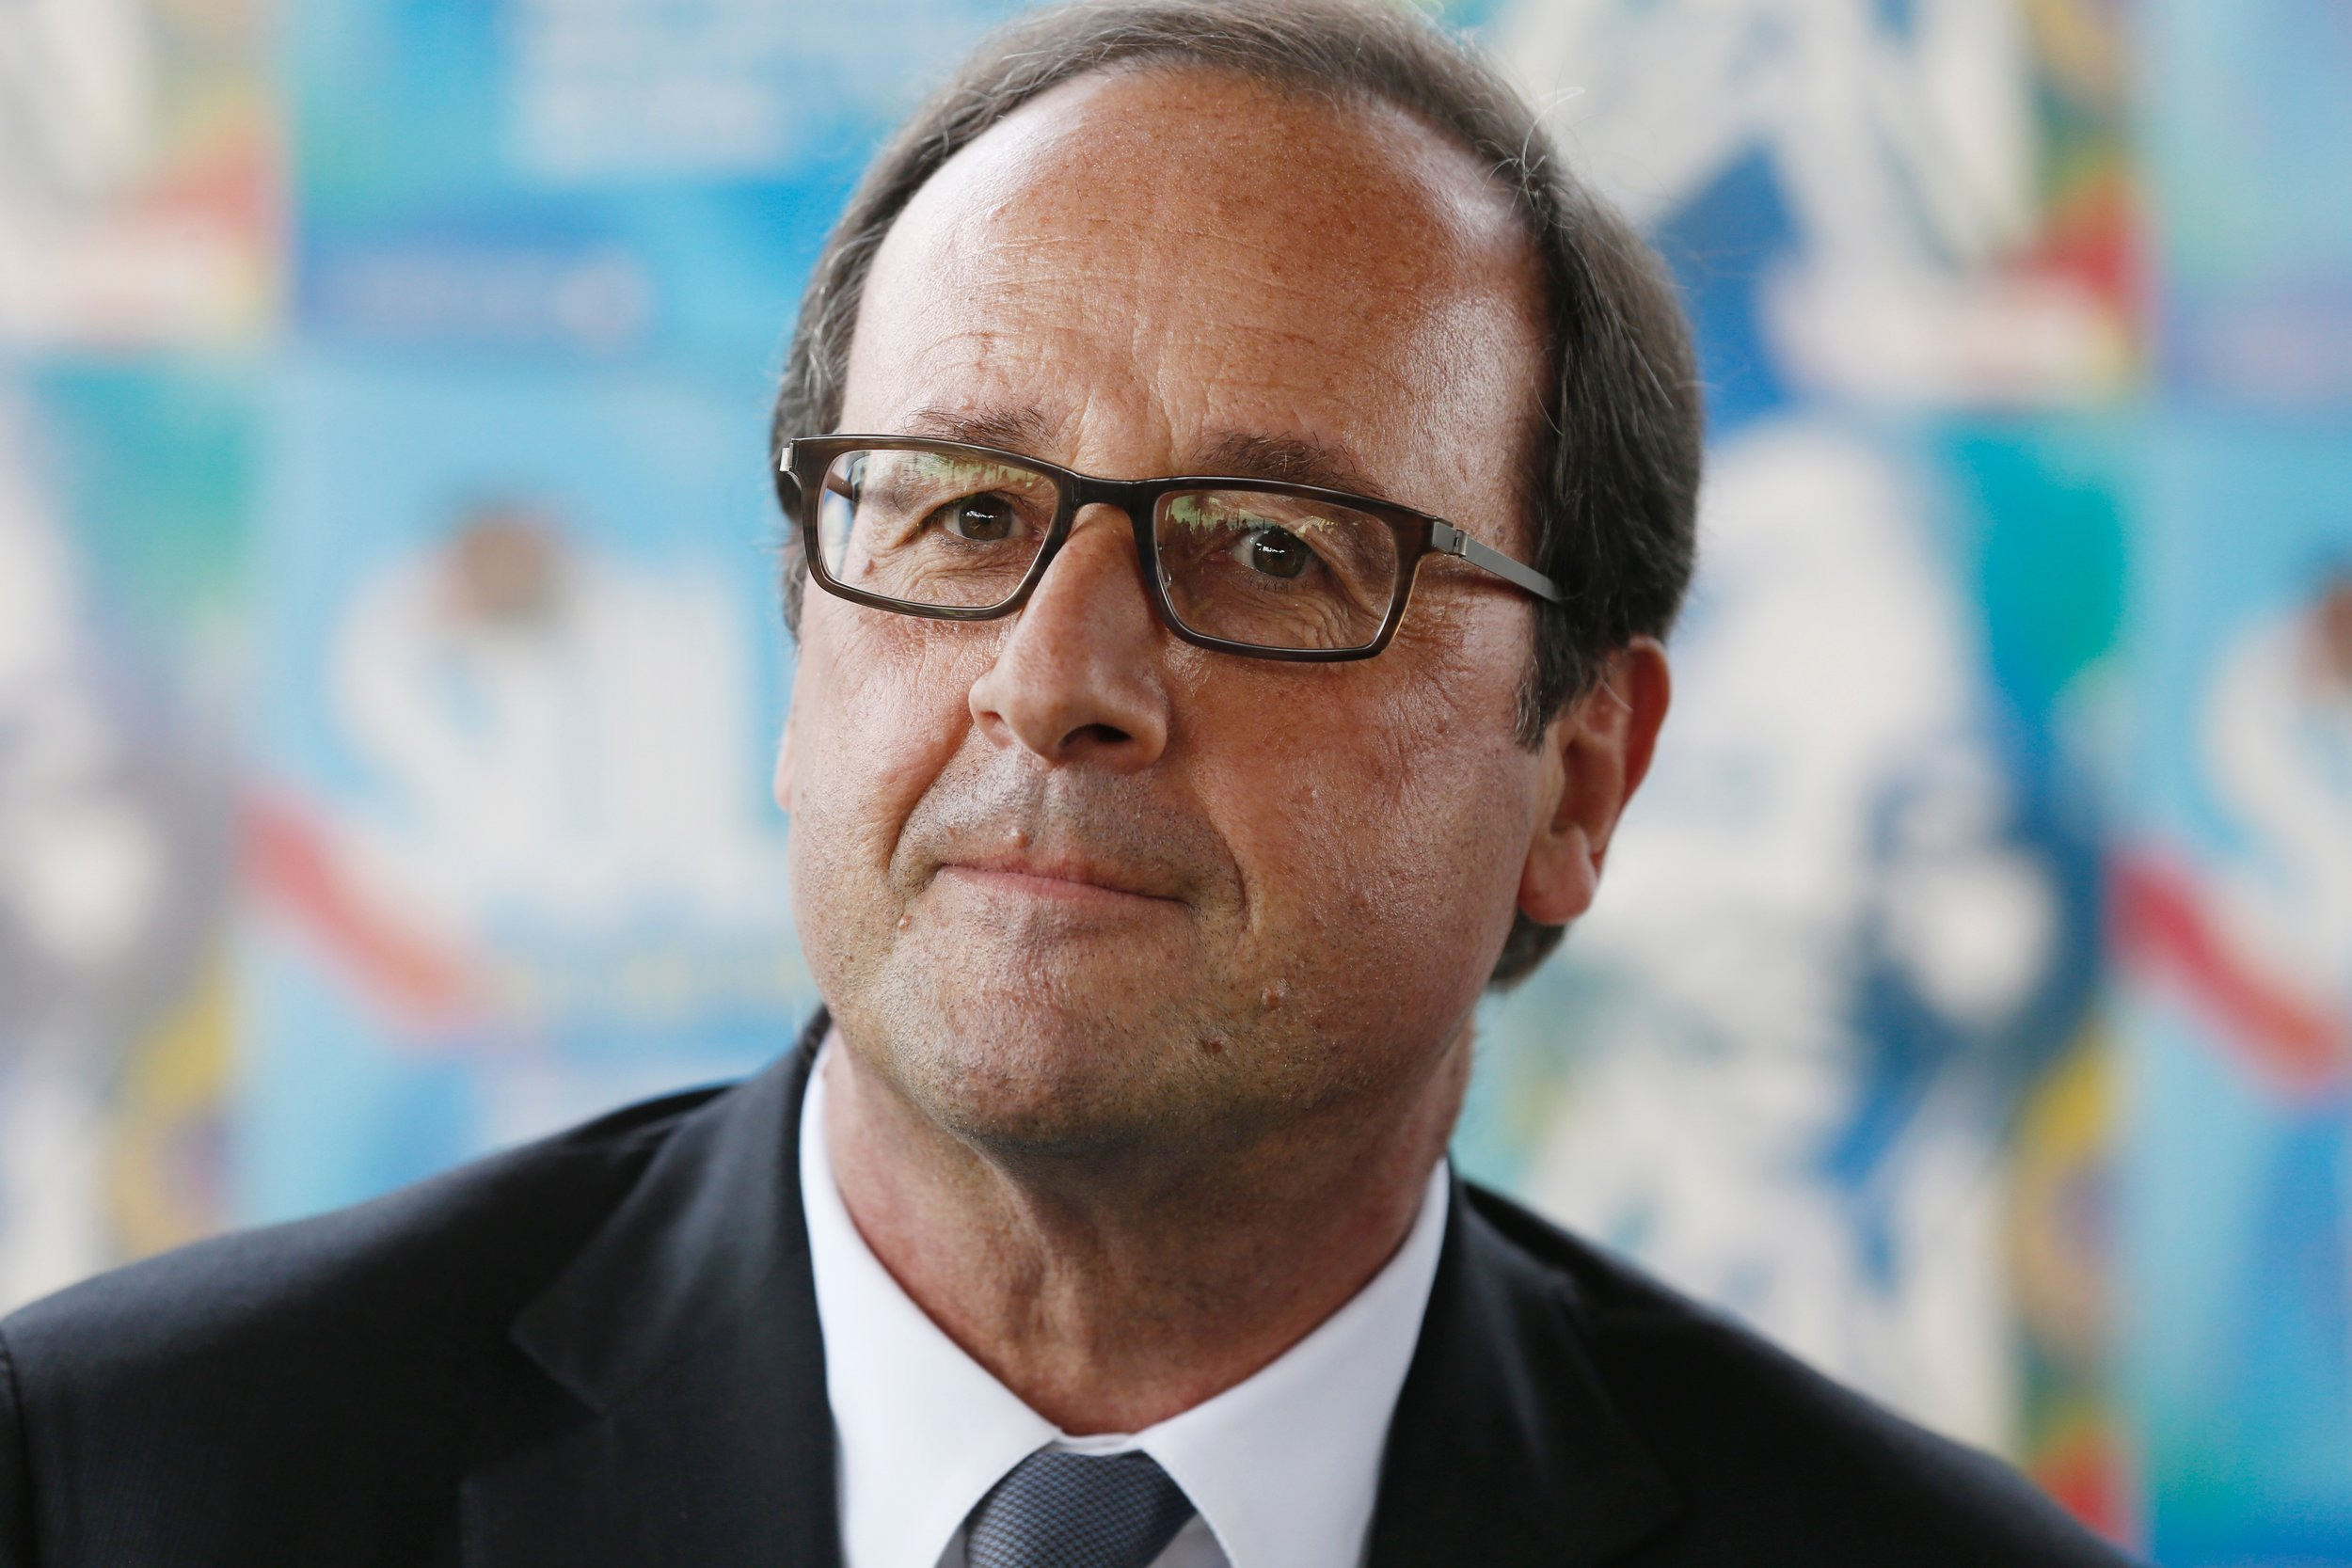 Francois Hollande - French Polititician, President